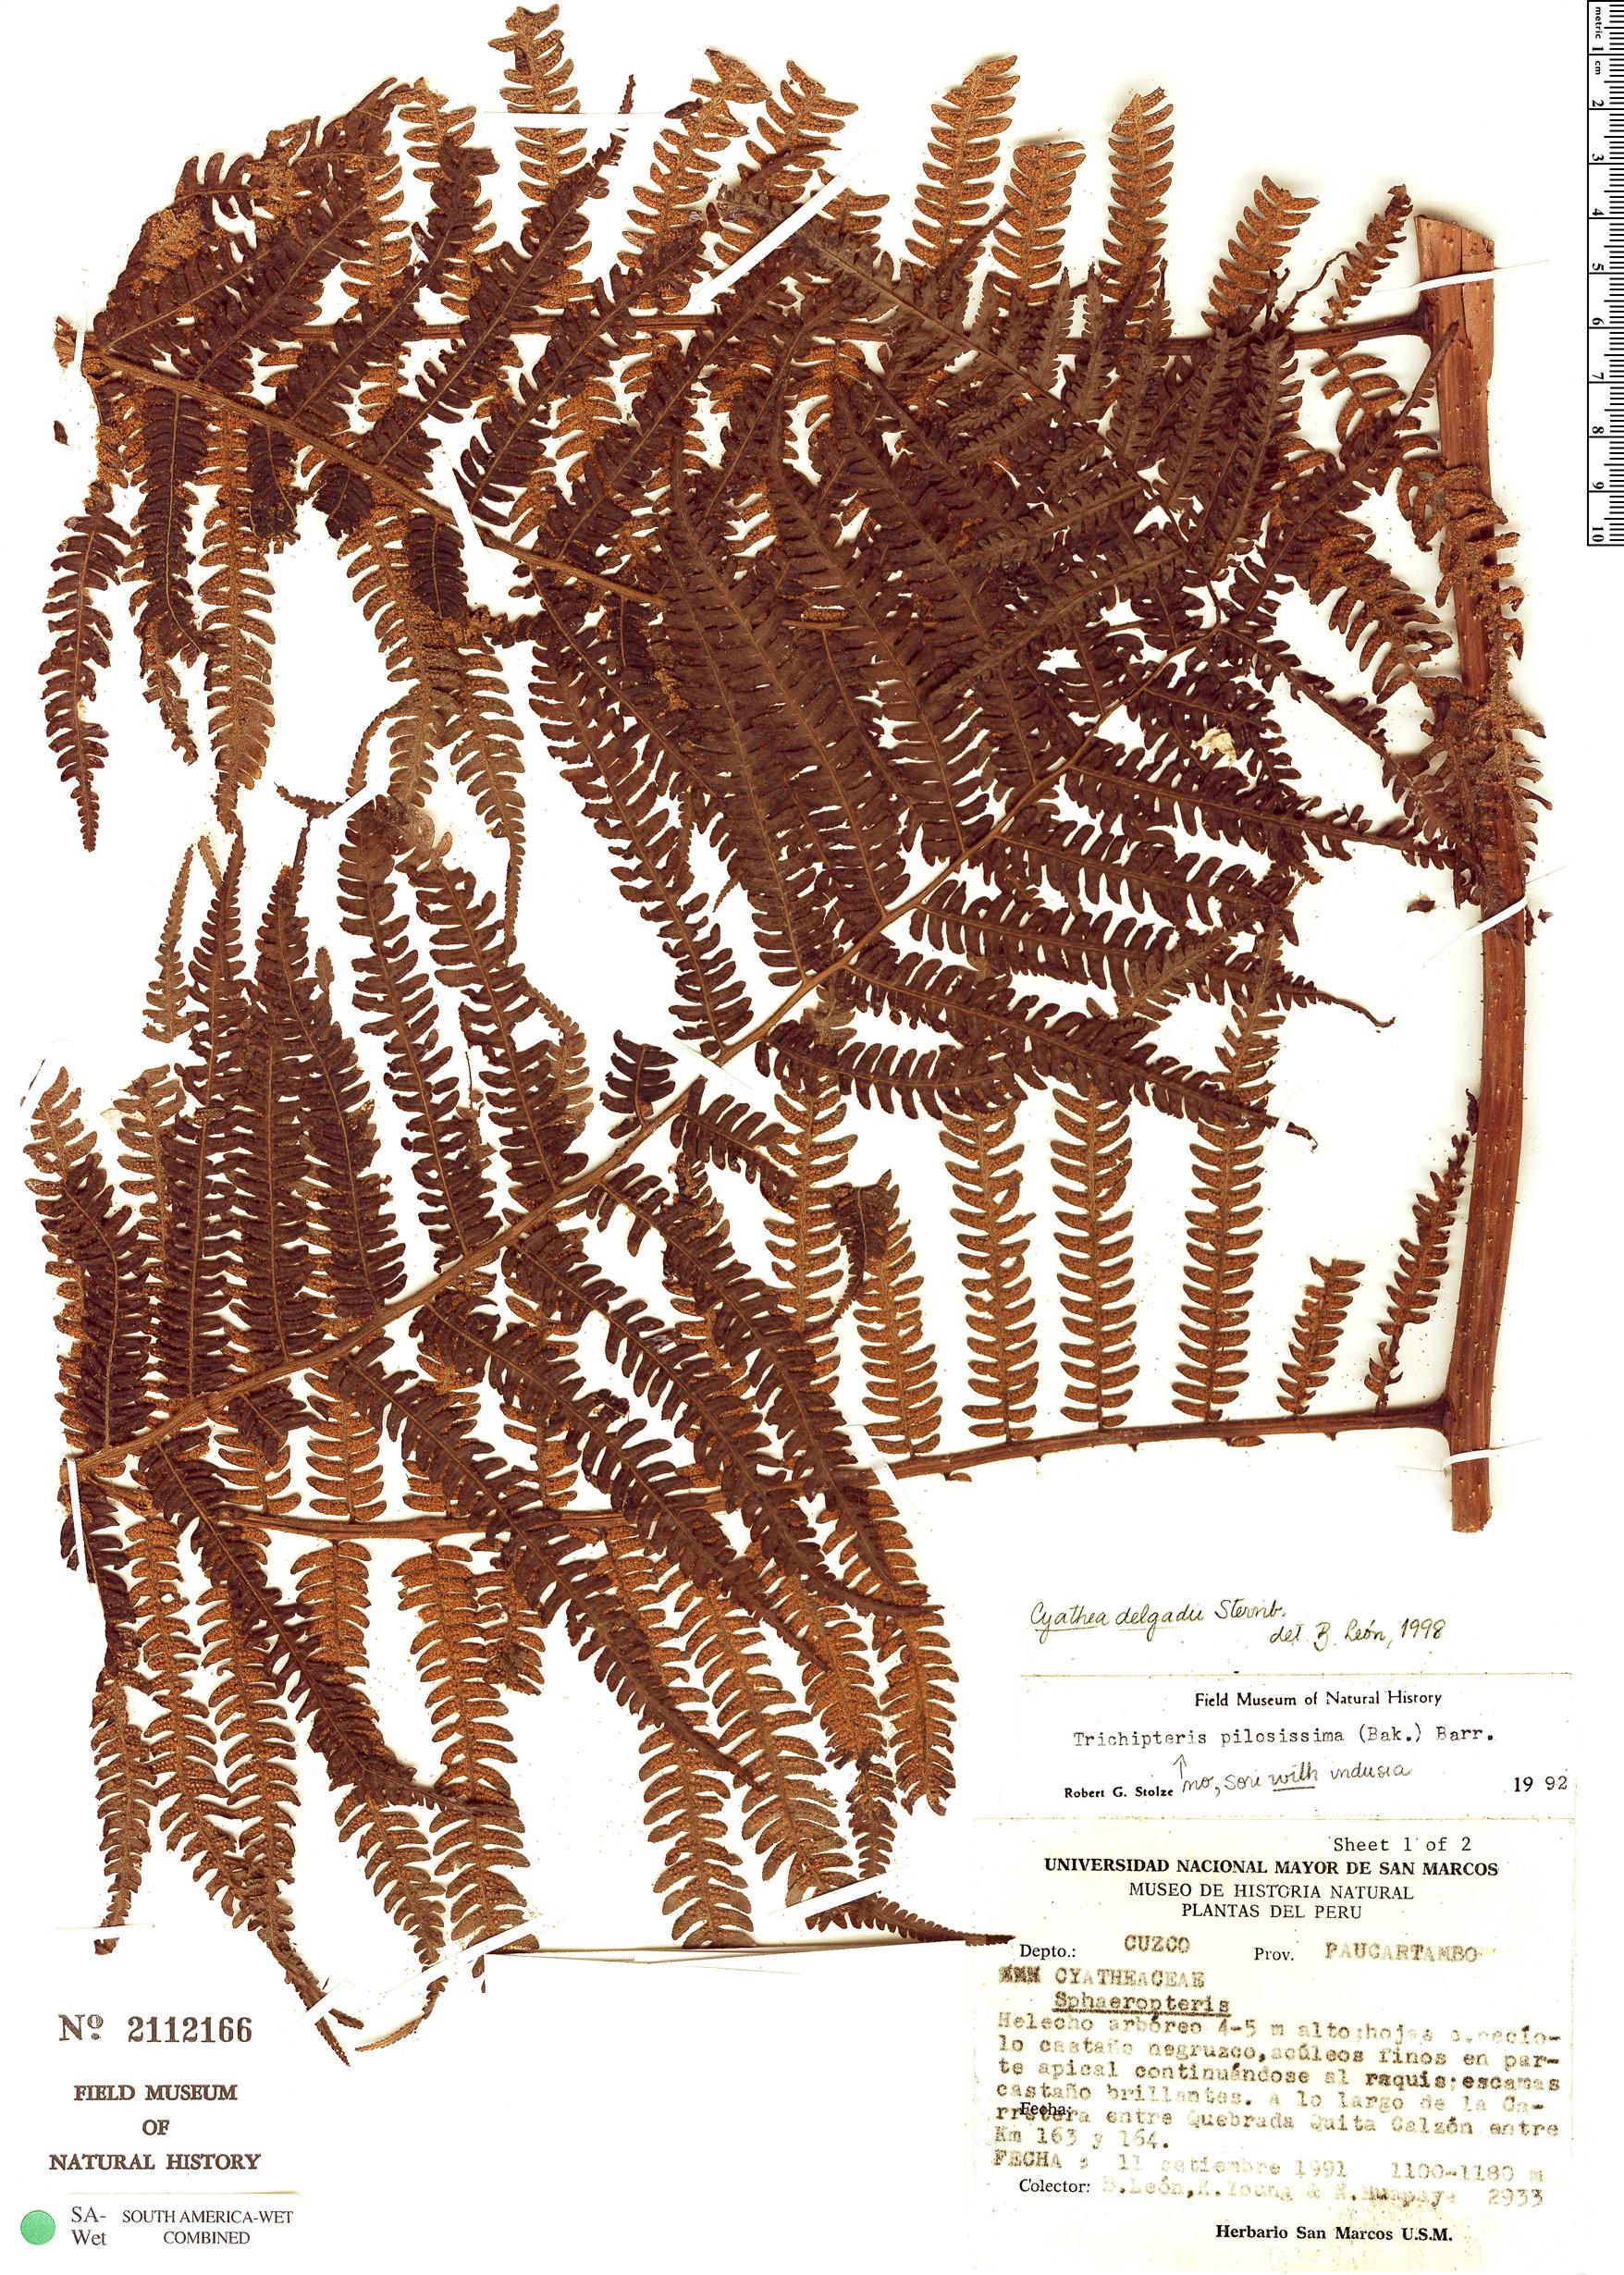 Specimen: Cyathea delgadii